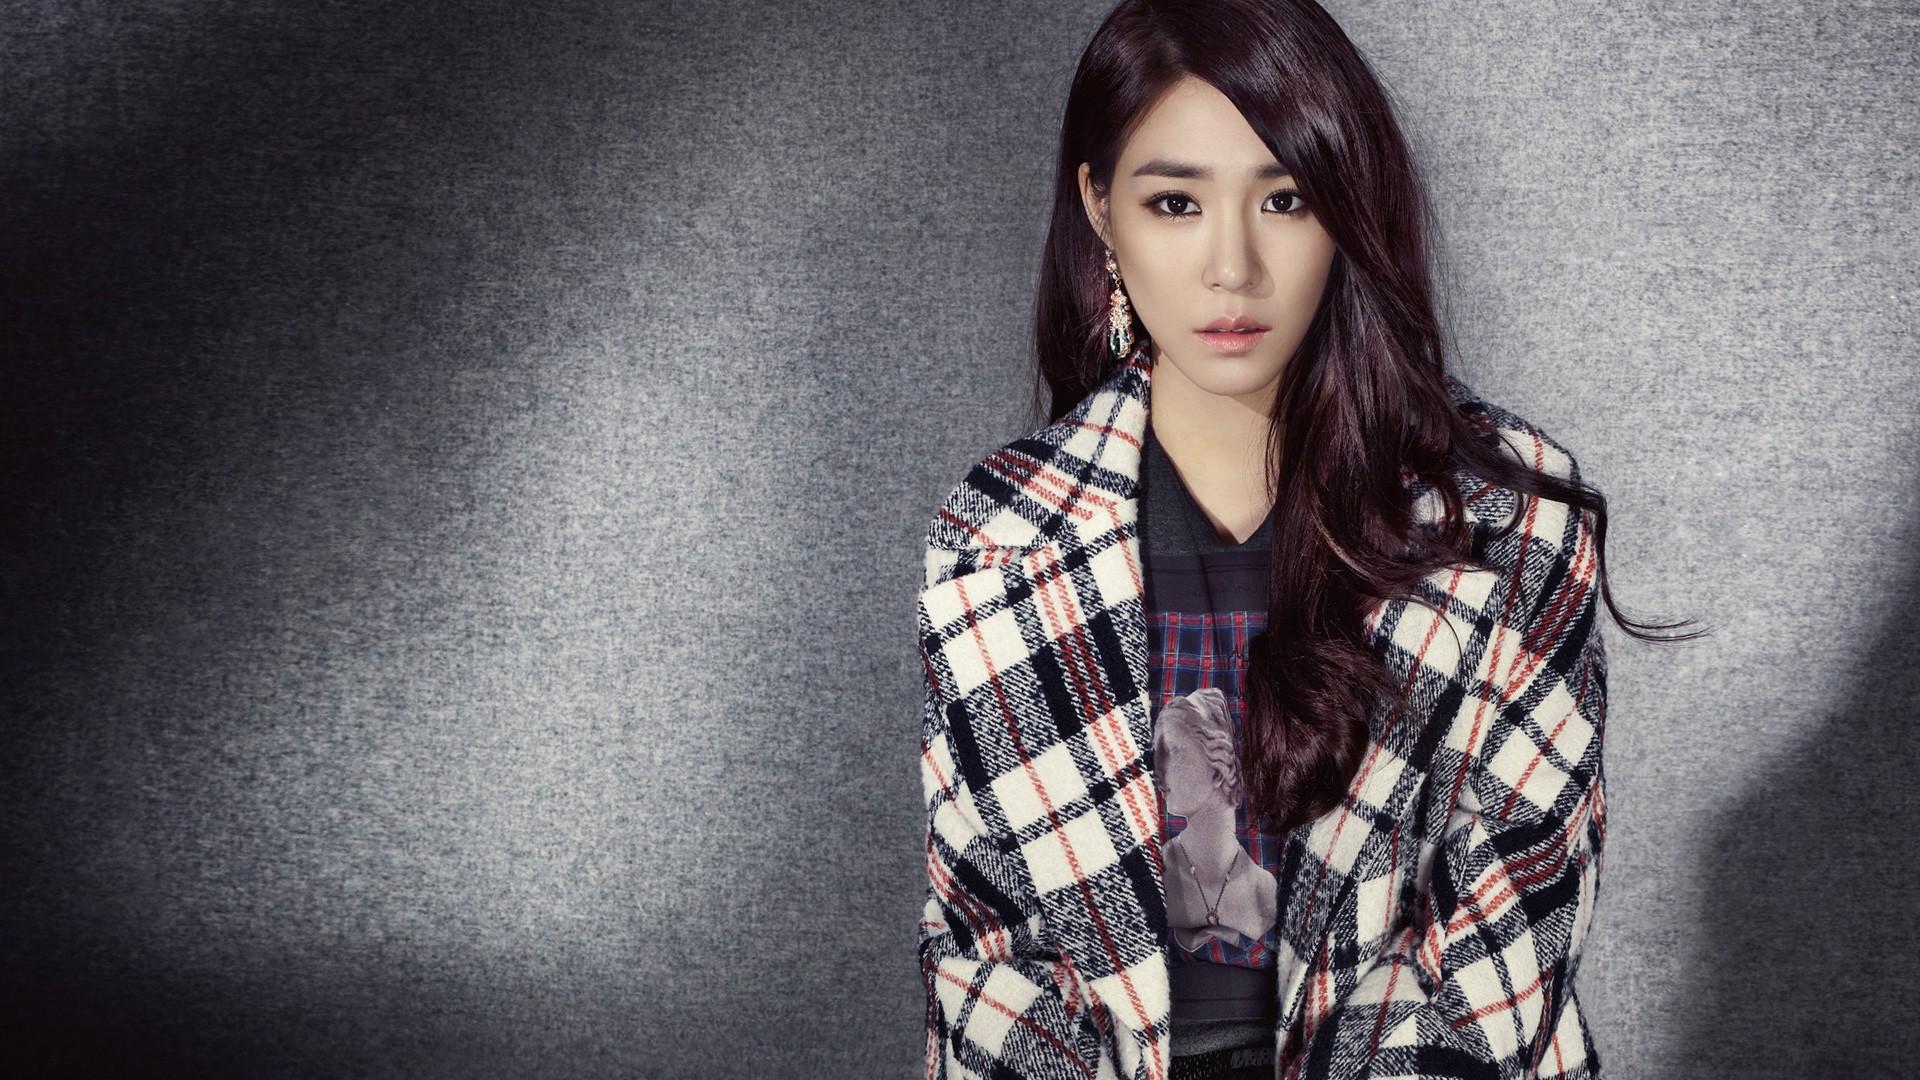 Wallpaper : black, model, long hair, Asian, jacket, pattern